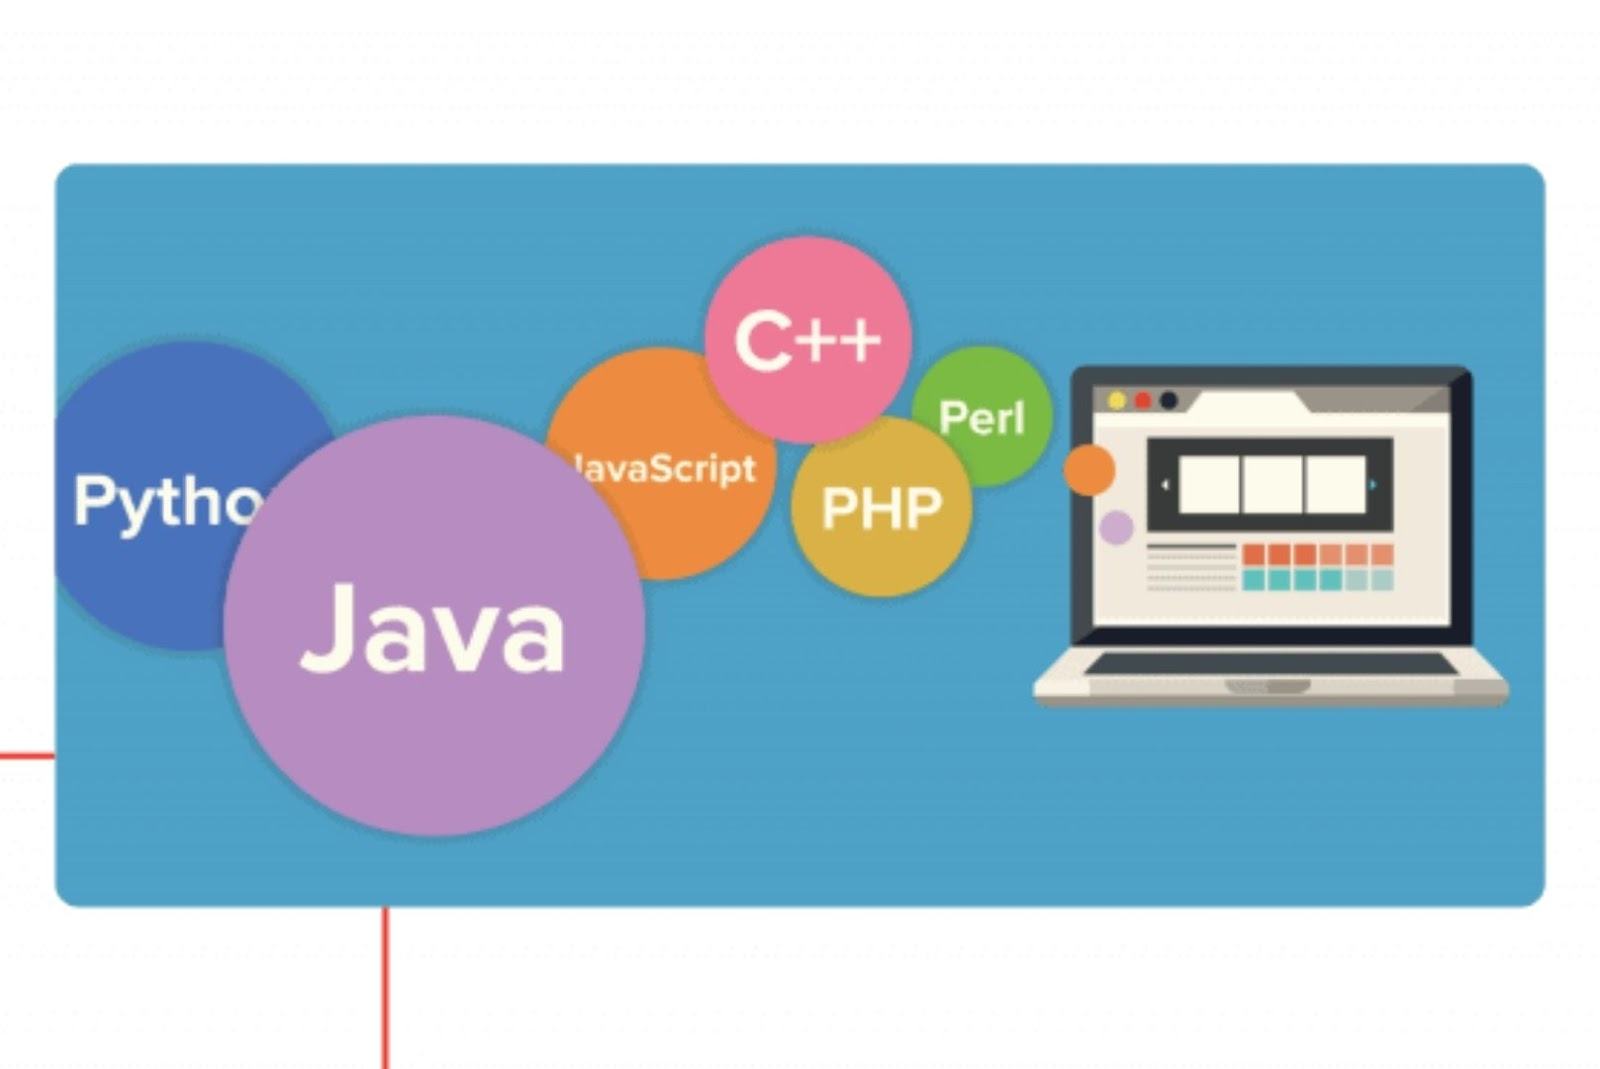 Programming languages and frameworks